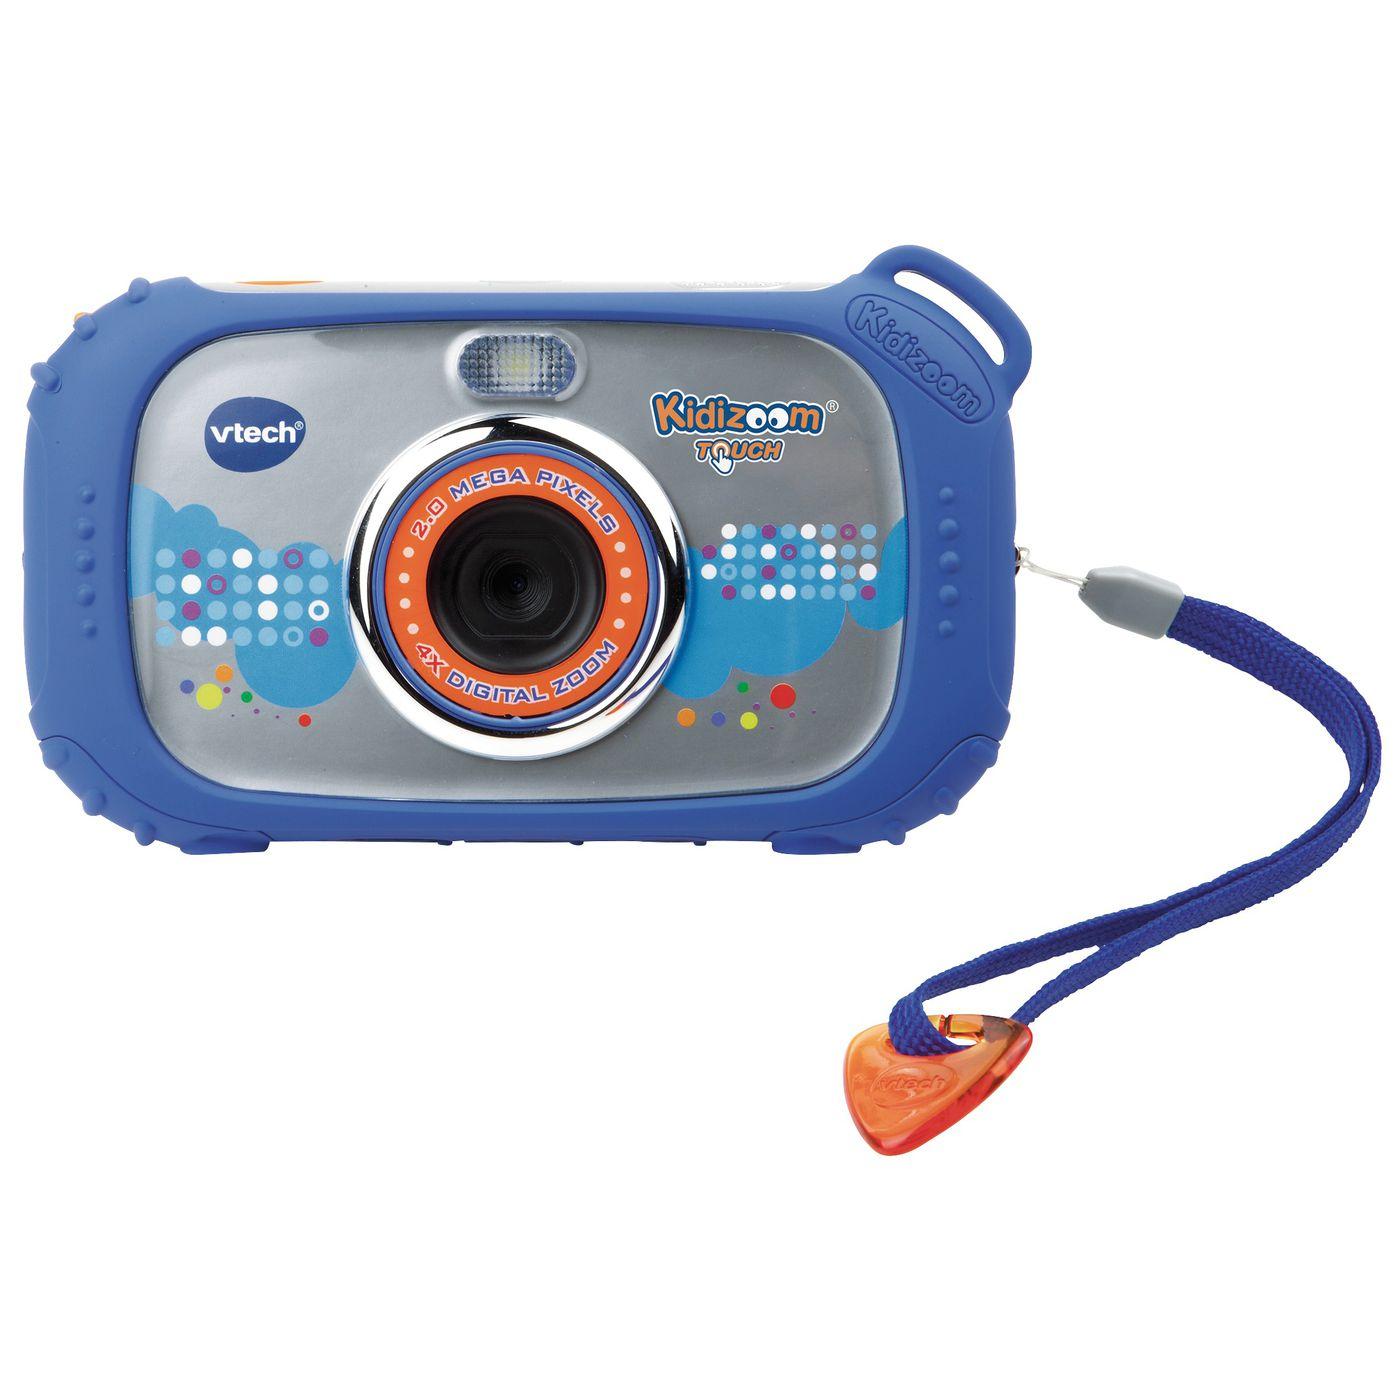 vtech Kidizoom Touch цифровая камера, от 5 лет